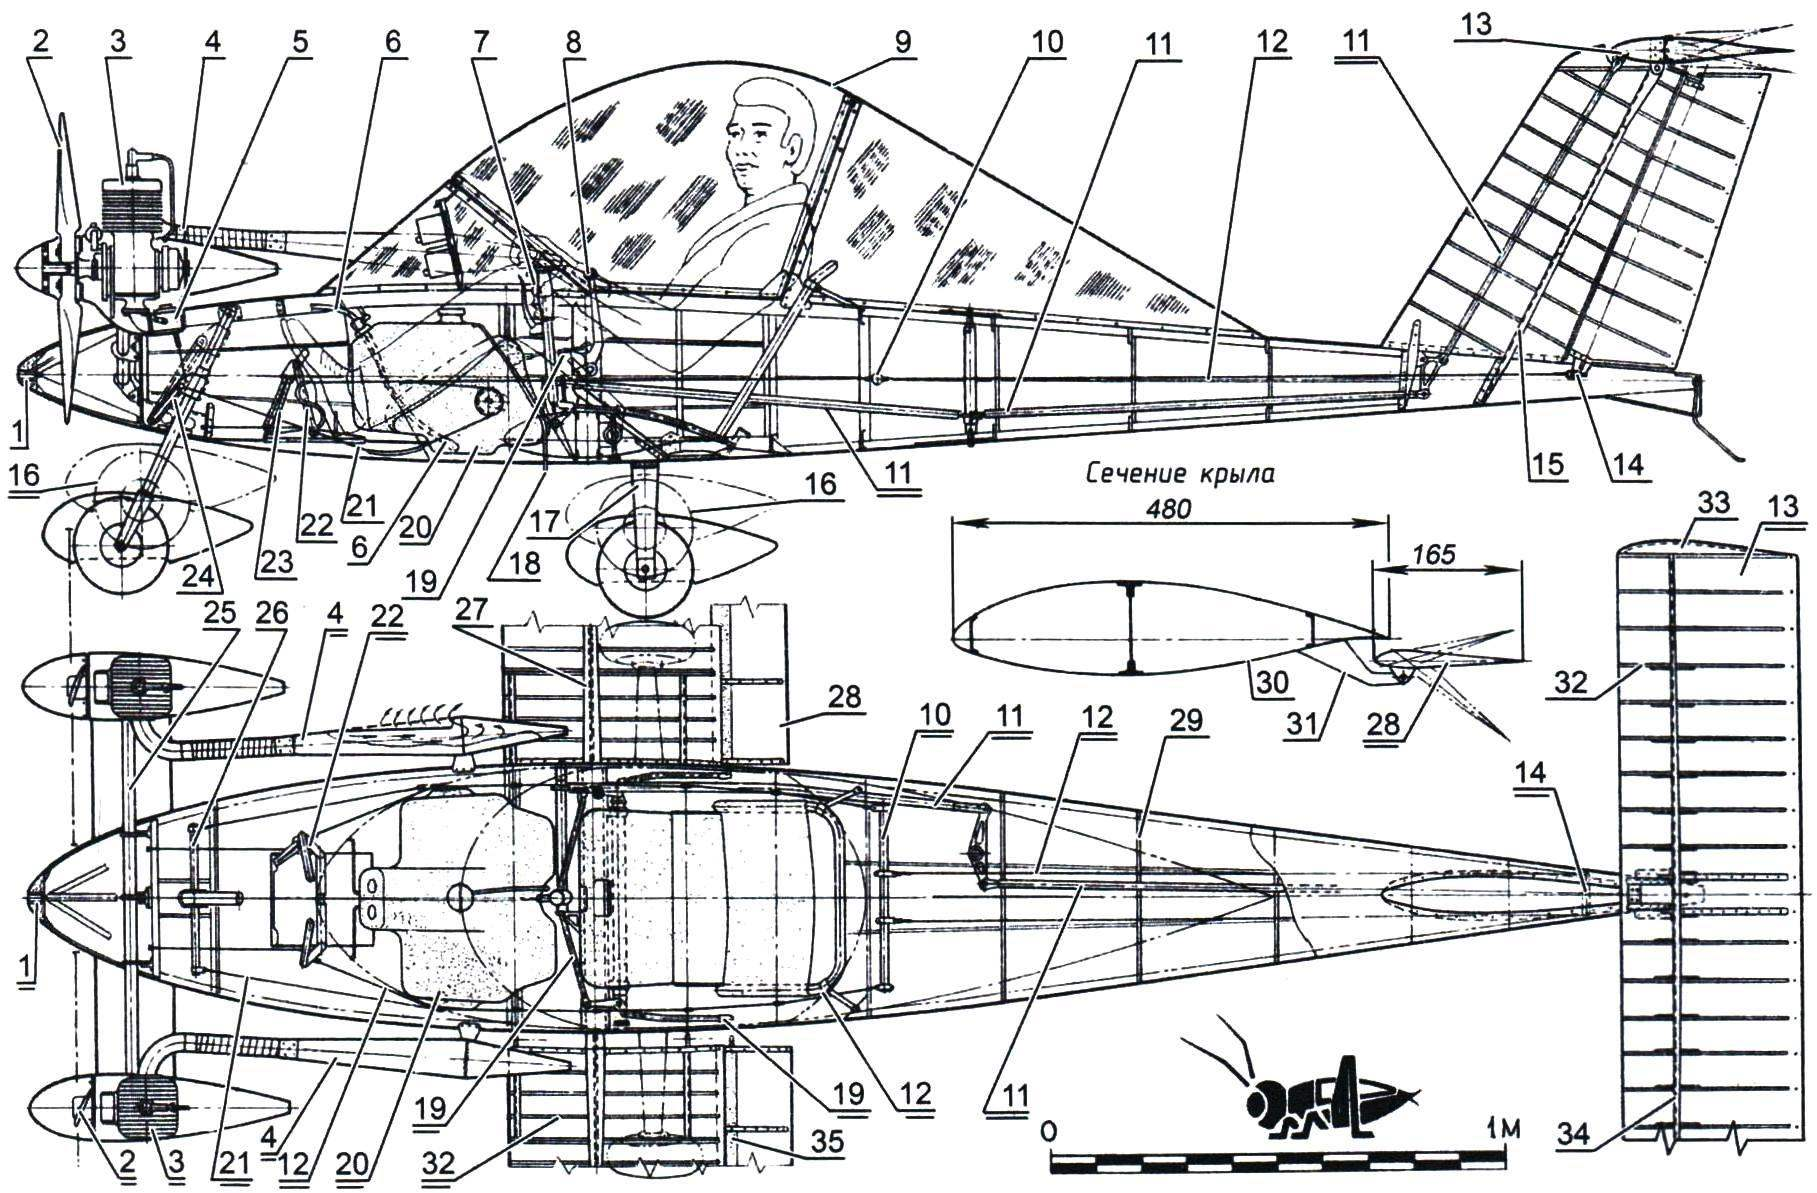 Компоновка самолёта «Кри-Кри»